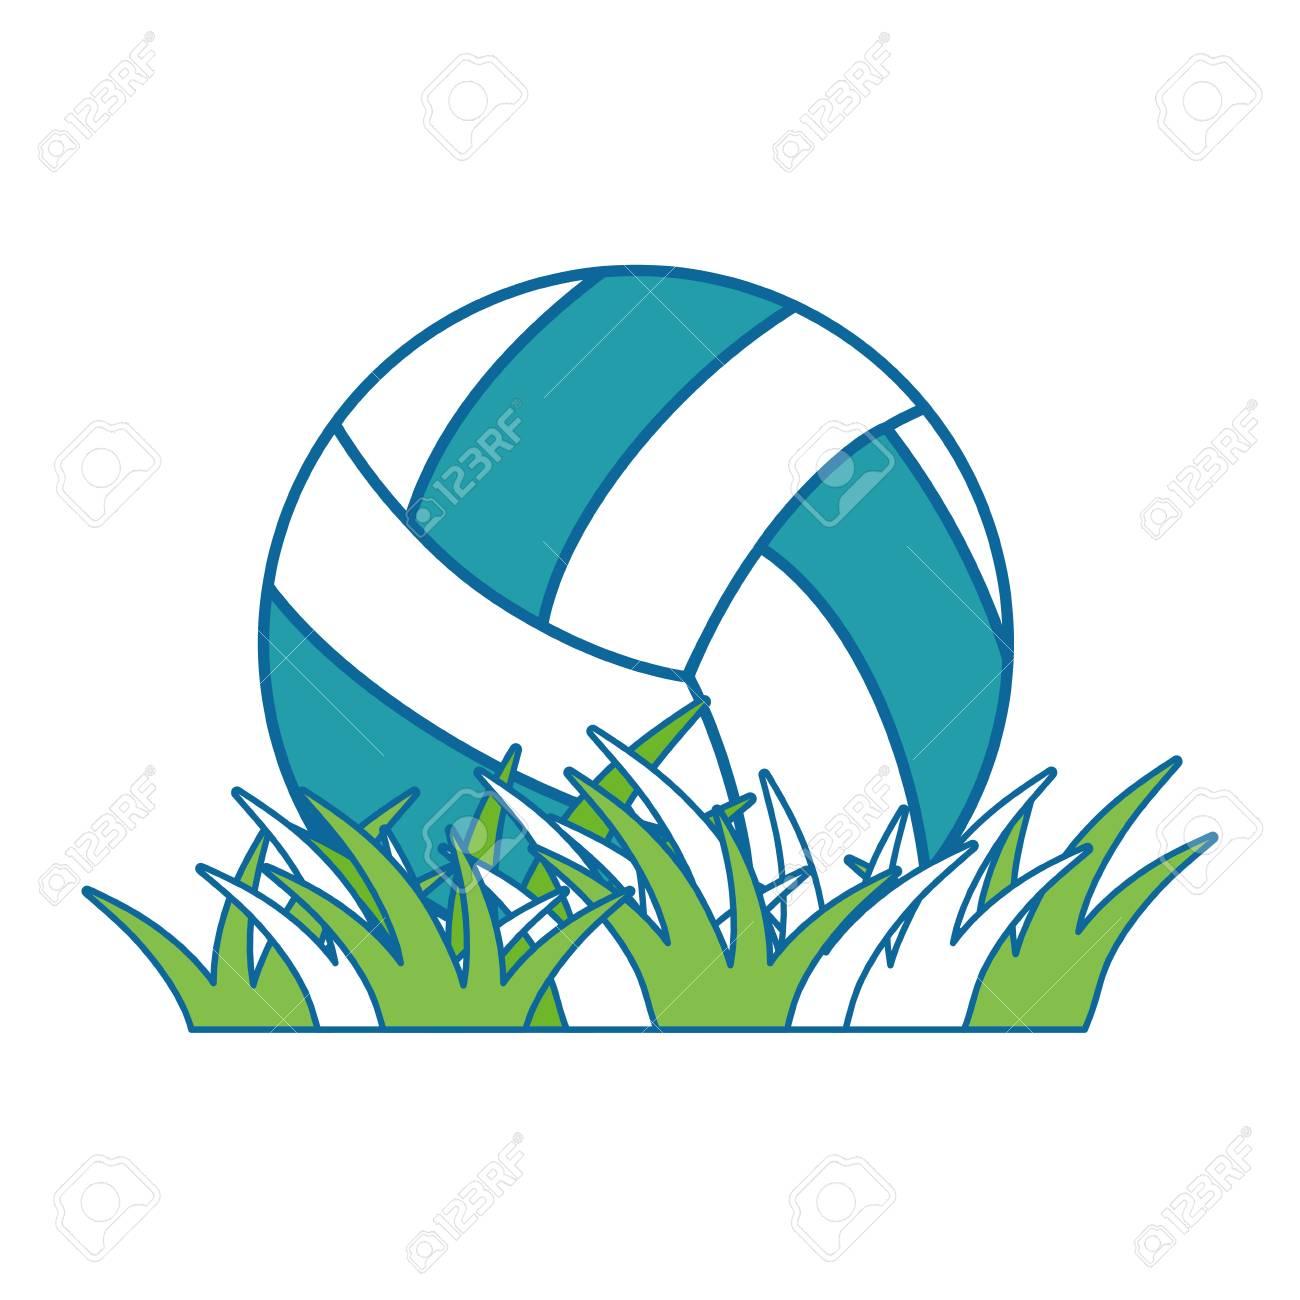 volleyball ball grass icon vector illustration graphic design rh 123rf com